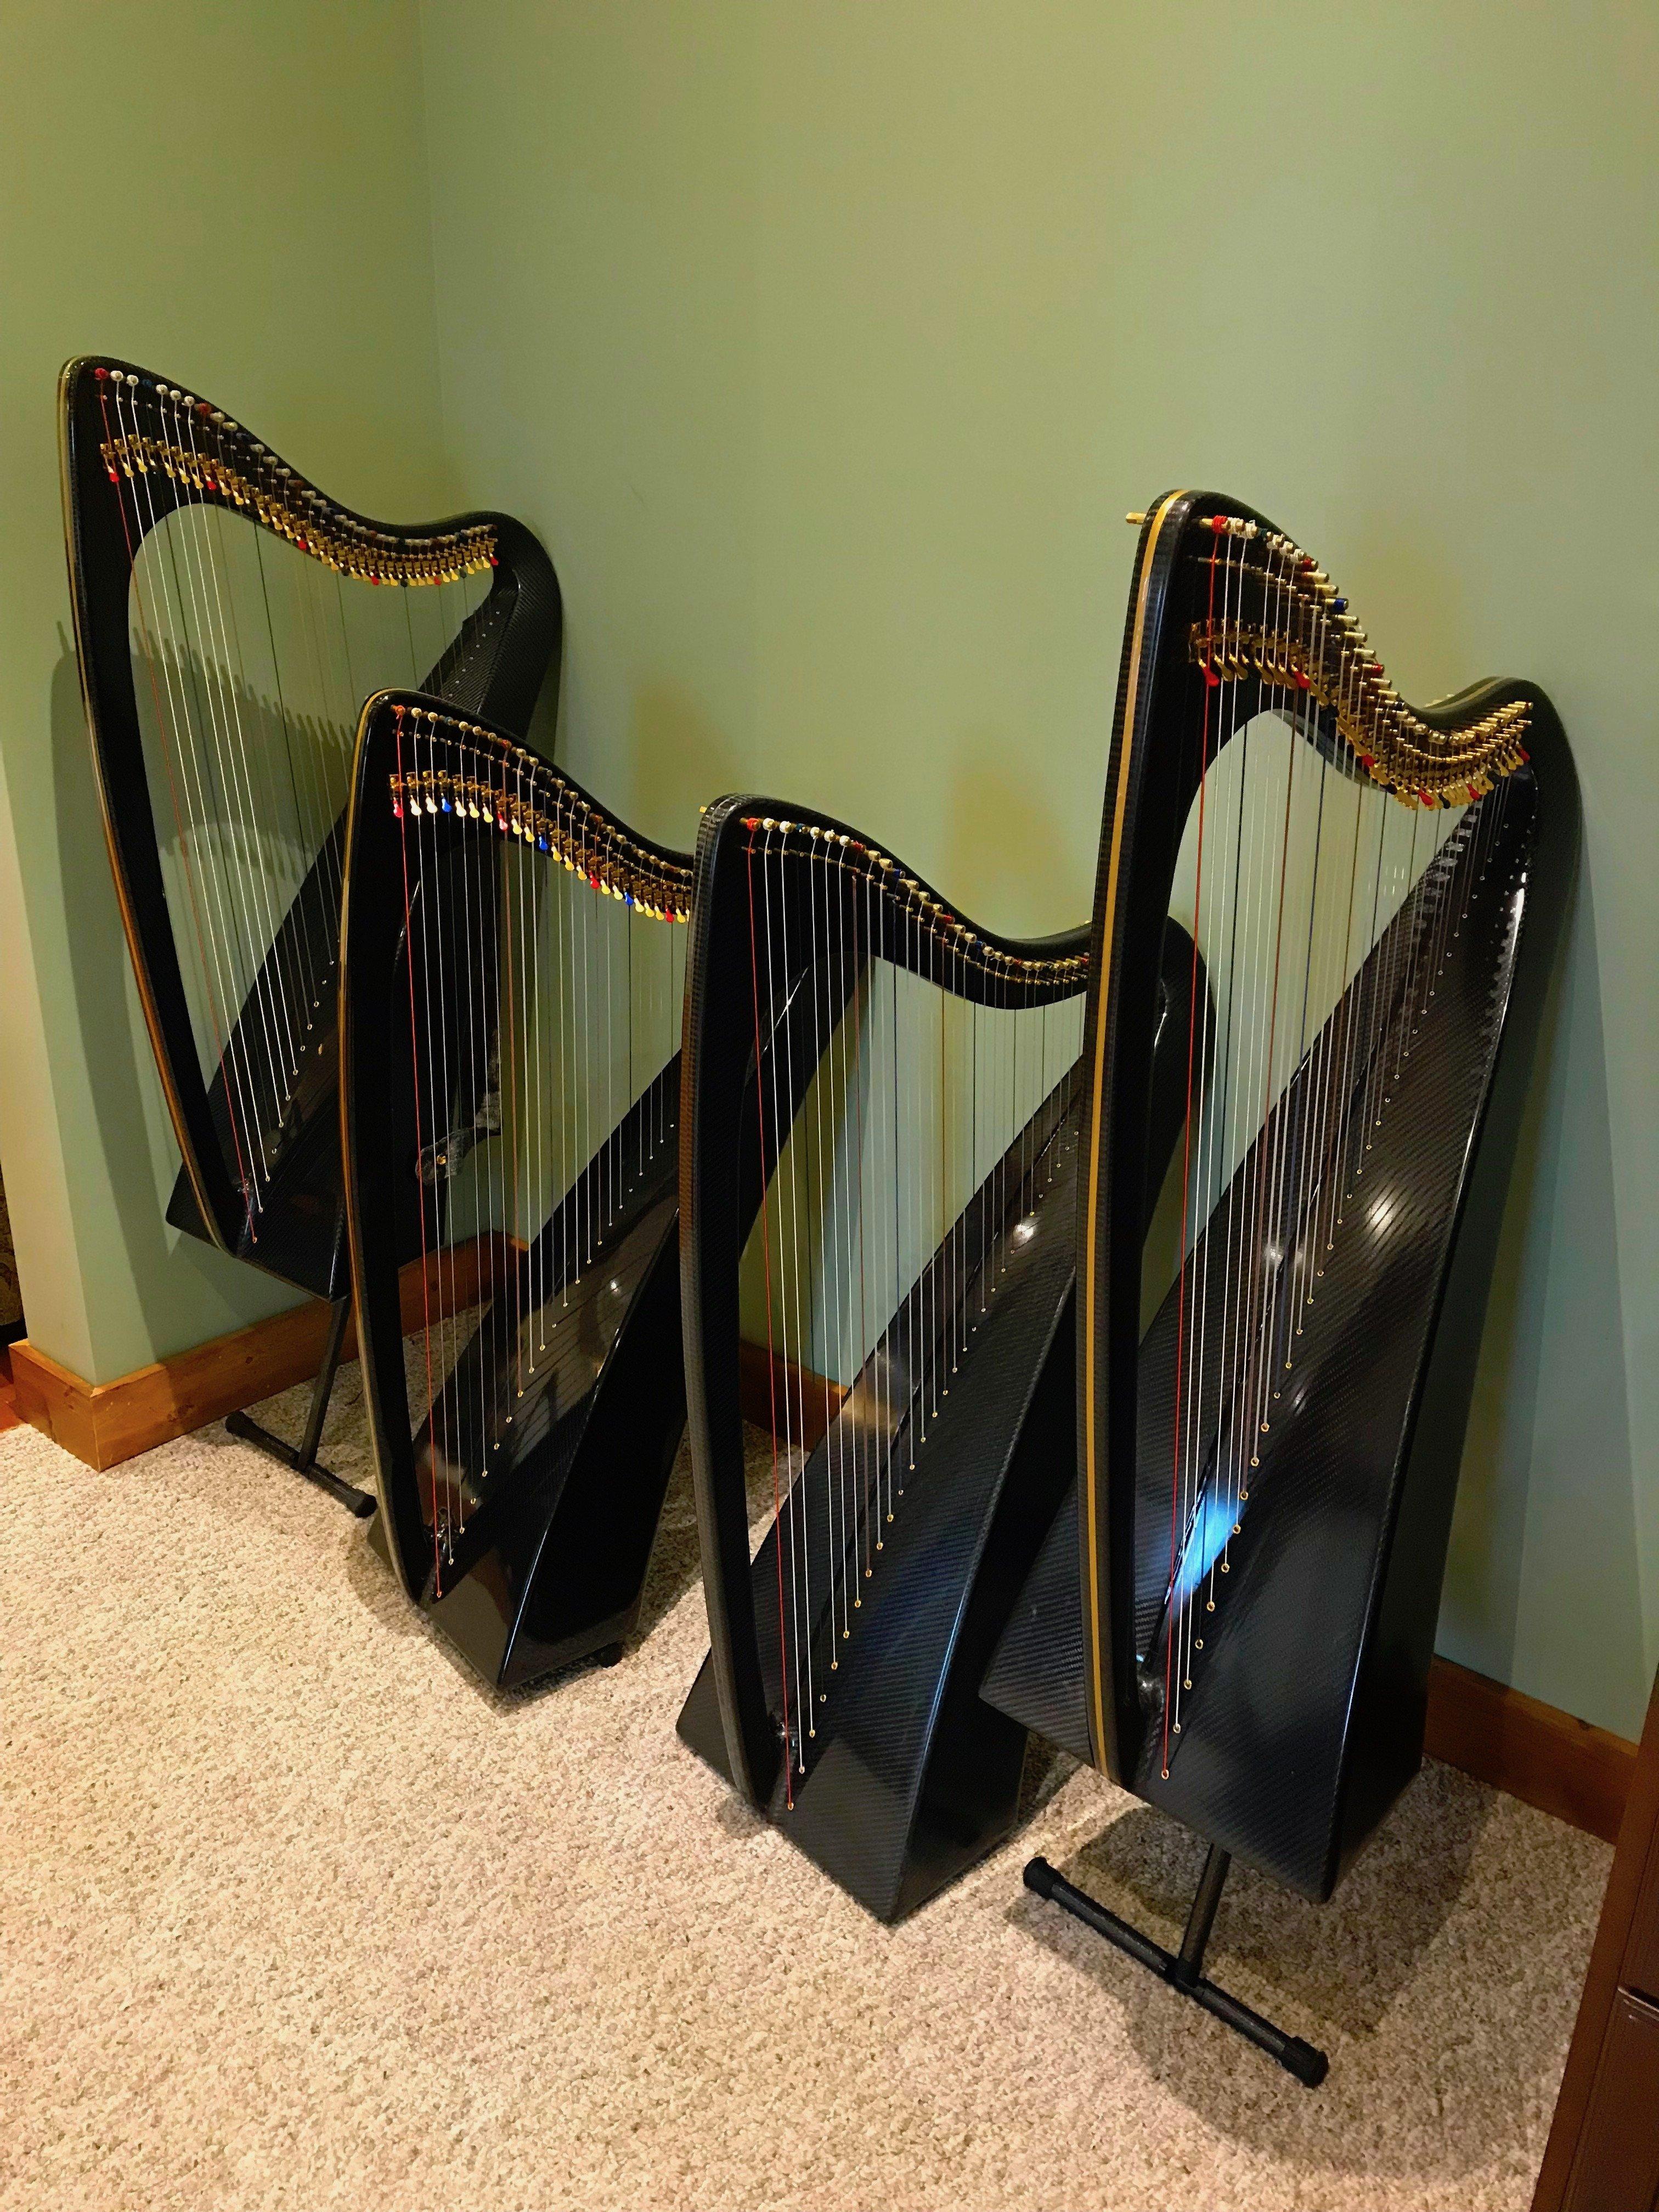 carbon fiber harps